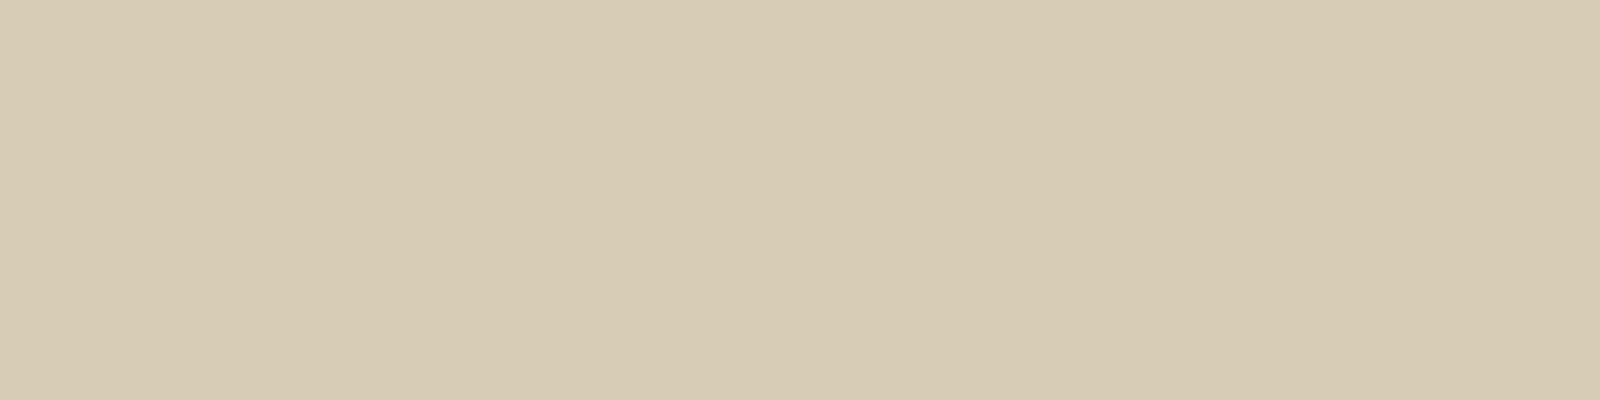 219 Almond Cream Gutter Color